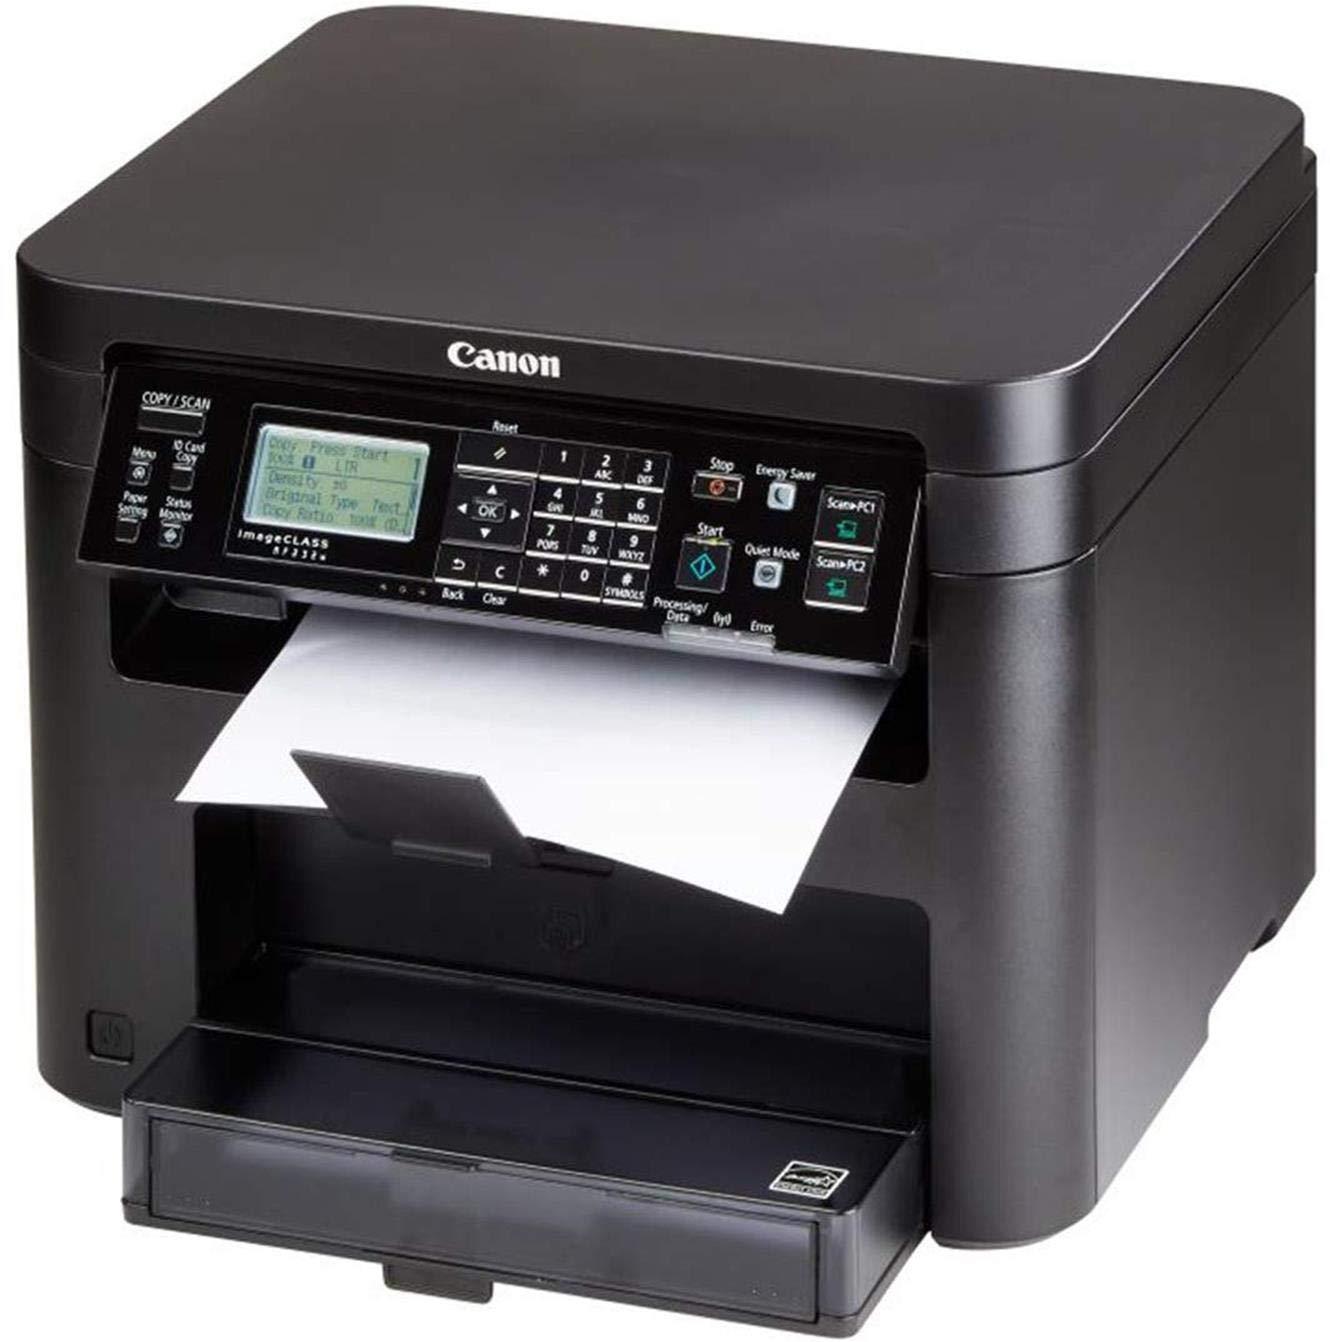 Canon MF232W Digital Multifunction Laser Printer